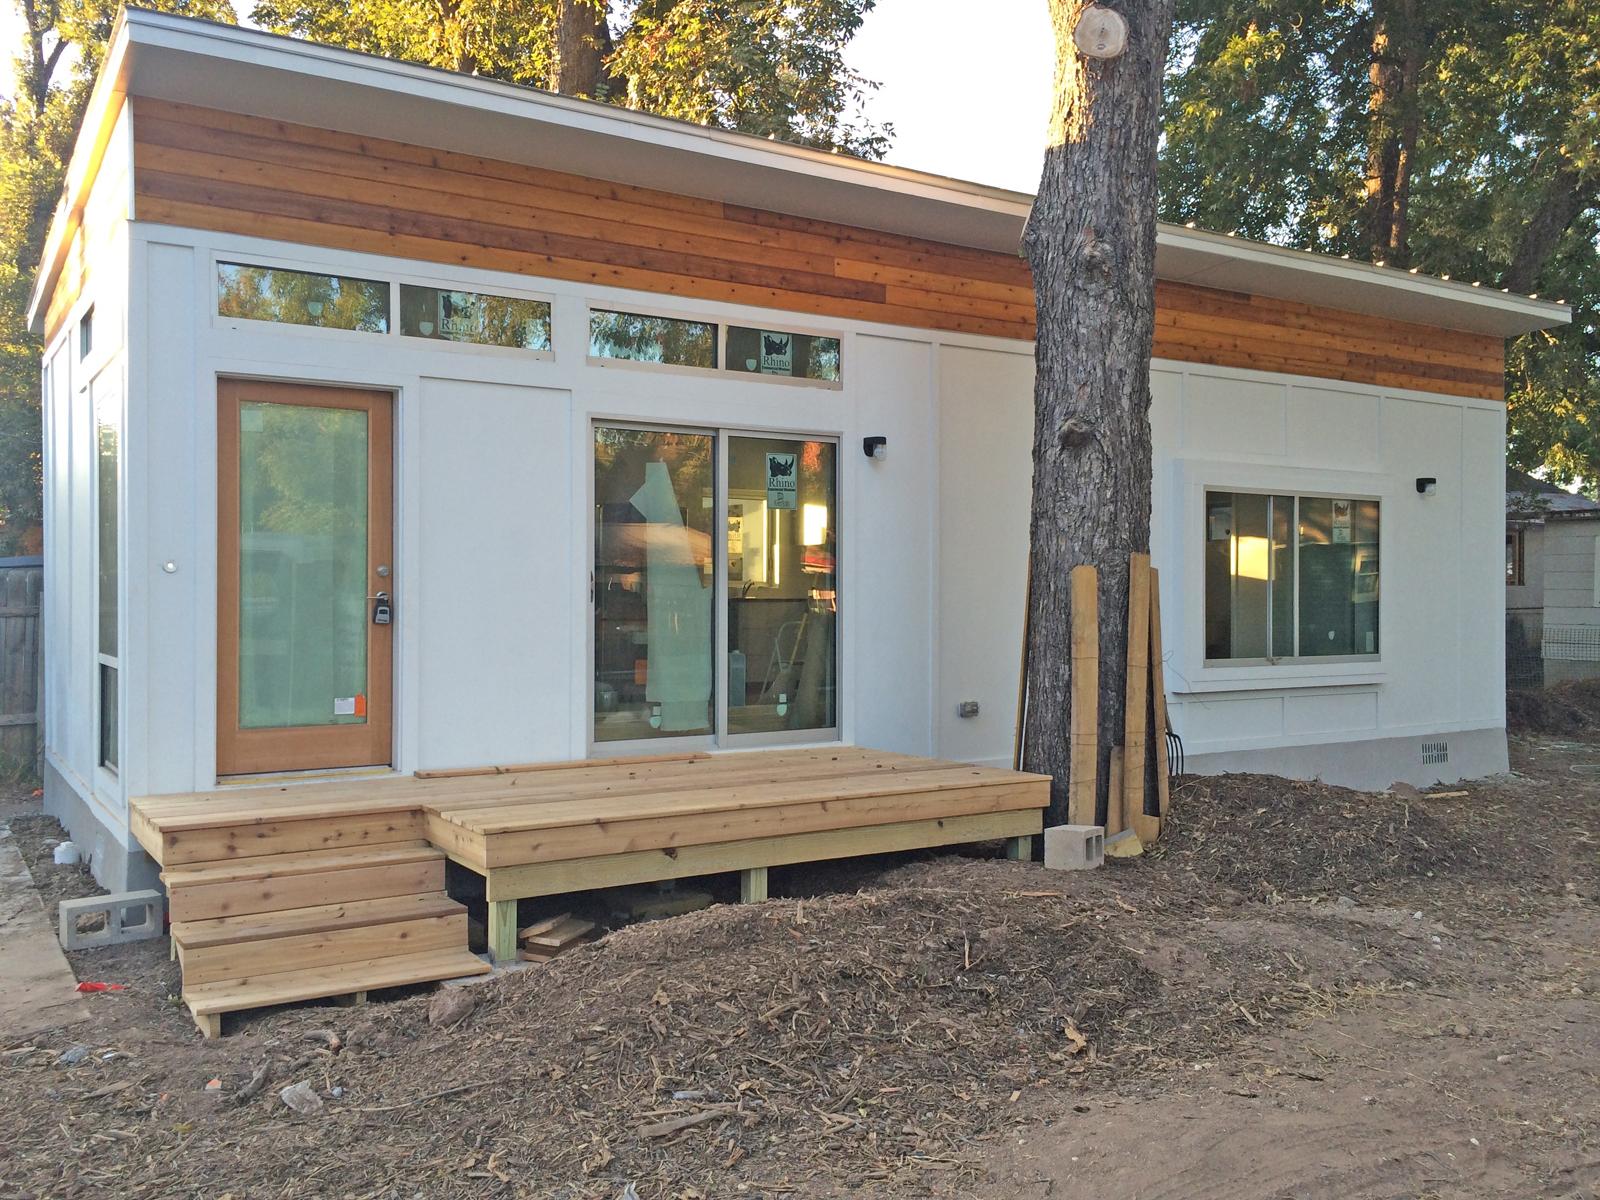 Modular Prefab Houses By Ma Modular Texas Prefab Modular Homes And Buildings